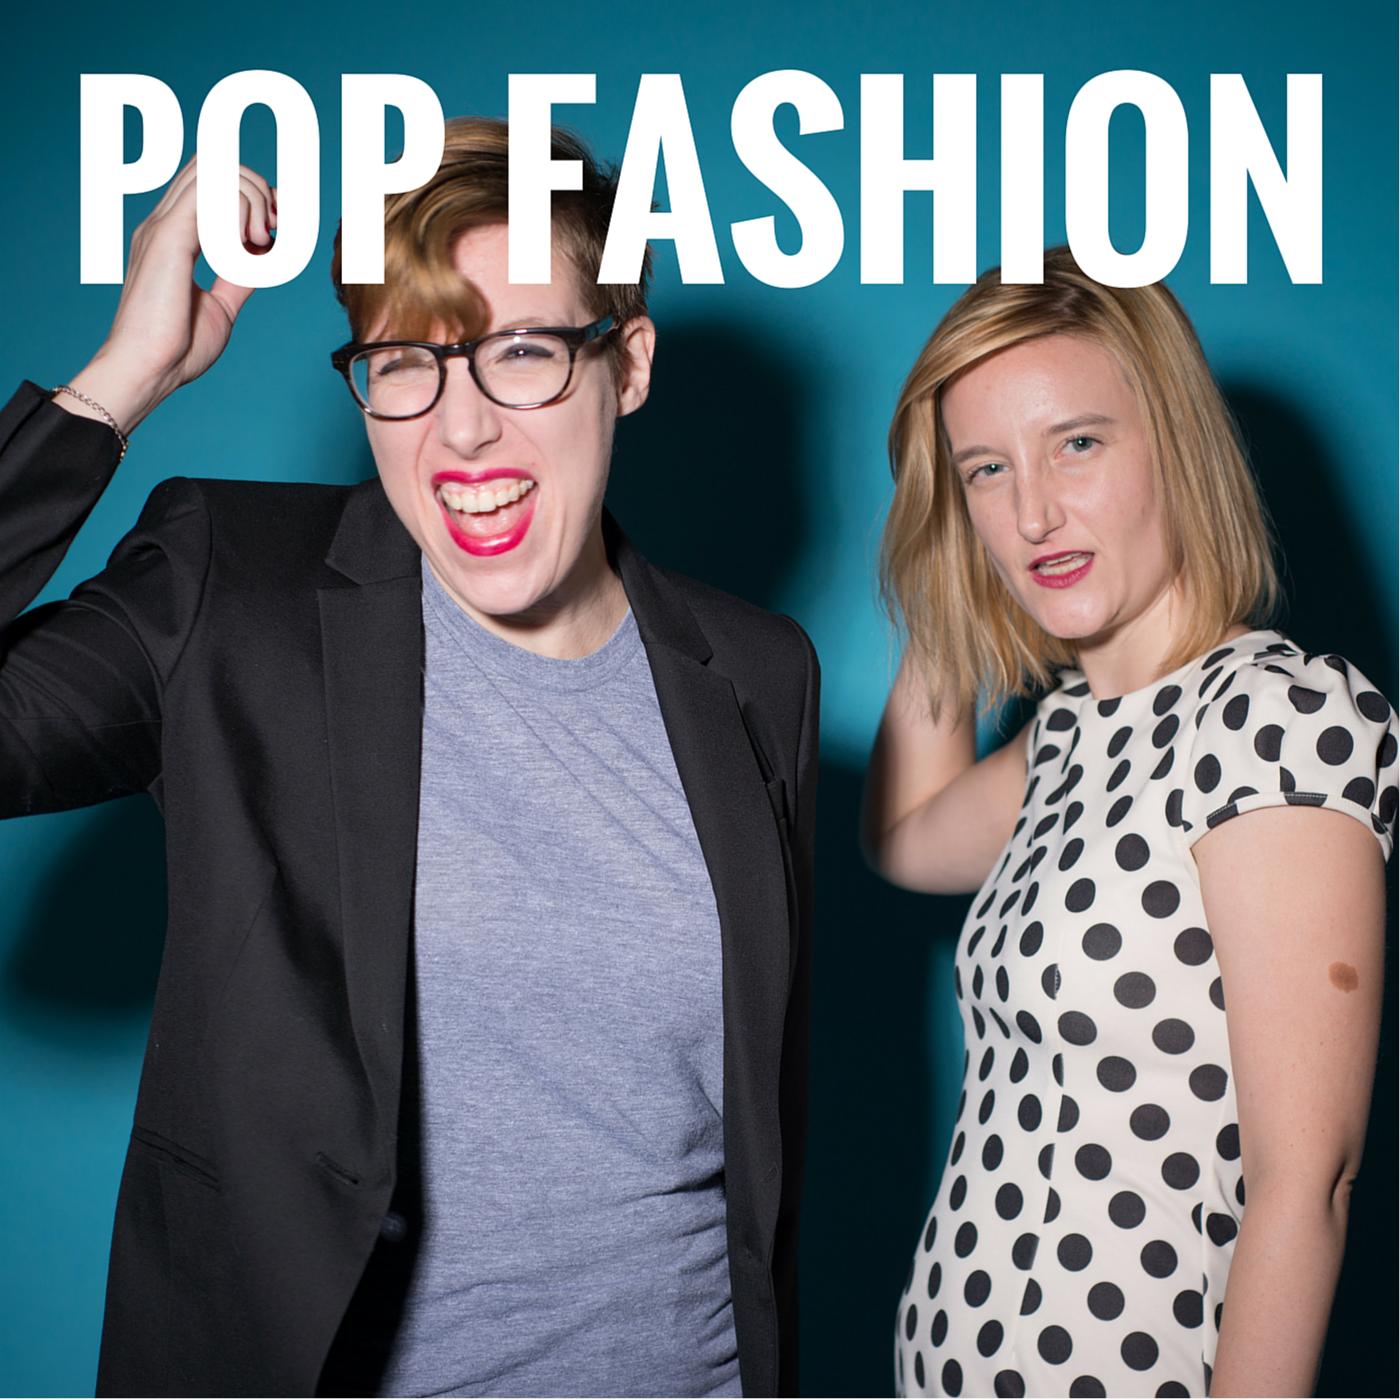 Dior Fashion, Silicon Valley Unicorns, Amazon Reviews